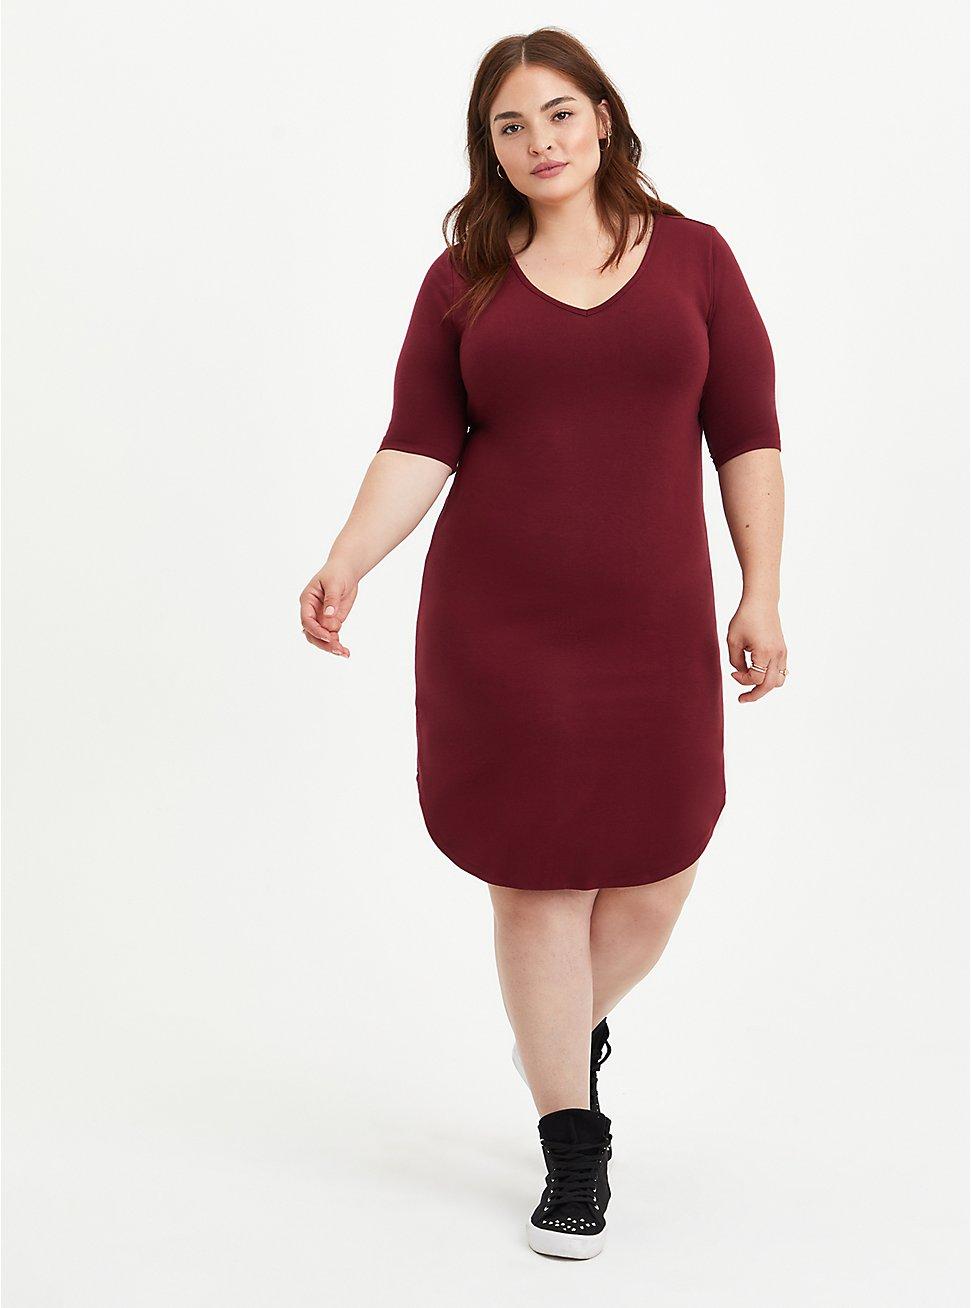 Plus Size Favorite T-Shirt Dress - Super Soft Burgundy, ZINFANDEL, hi-res